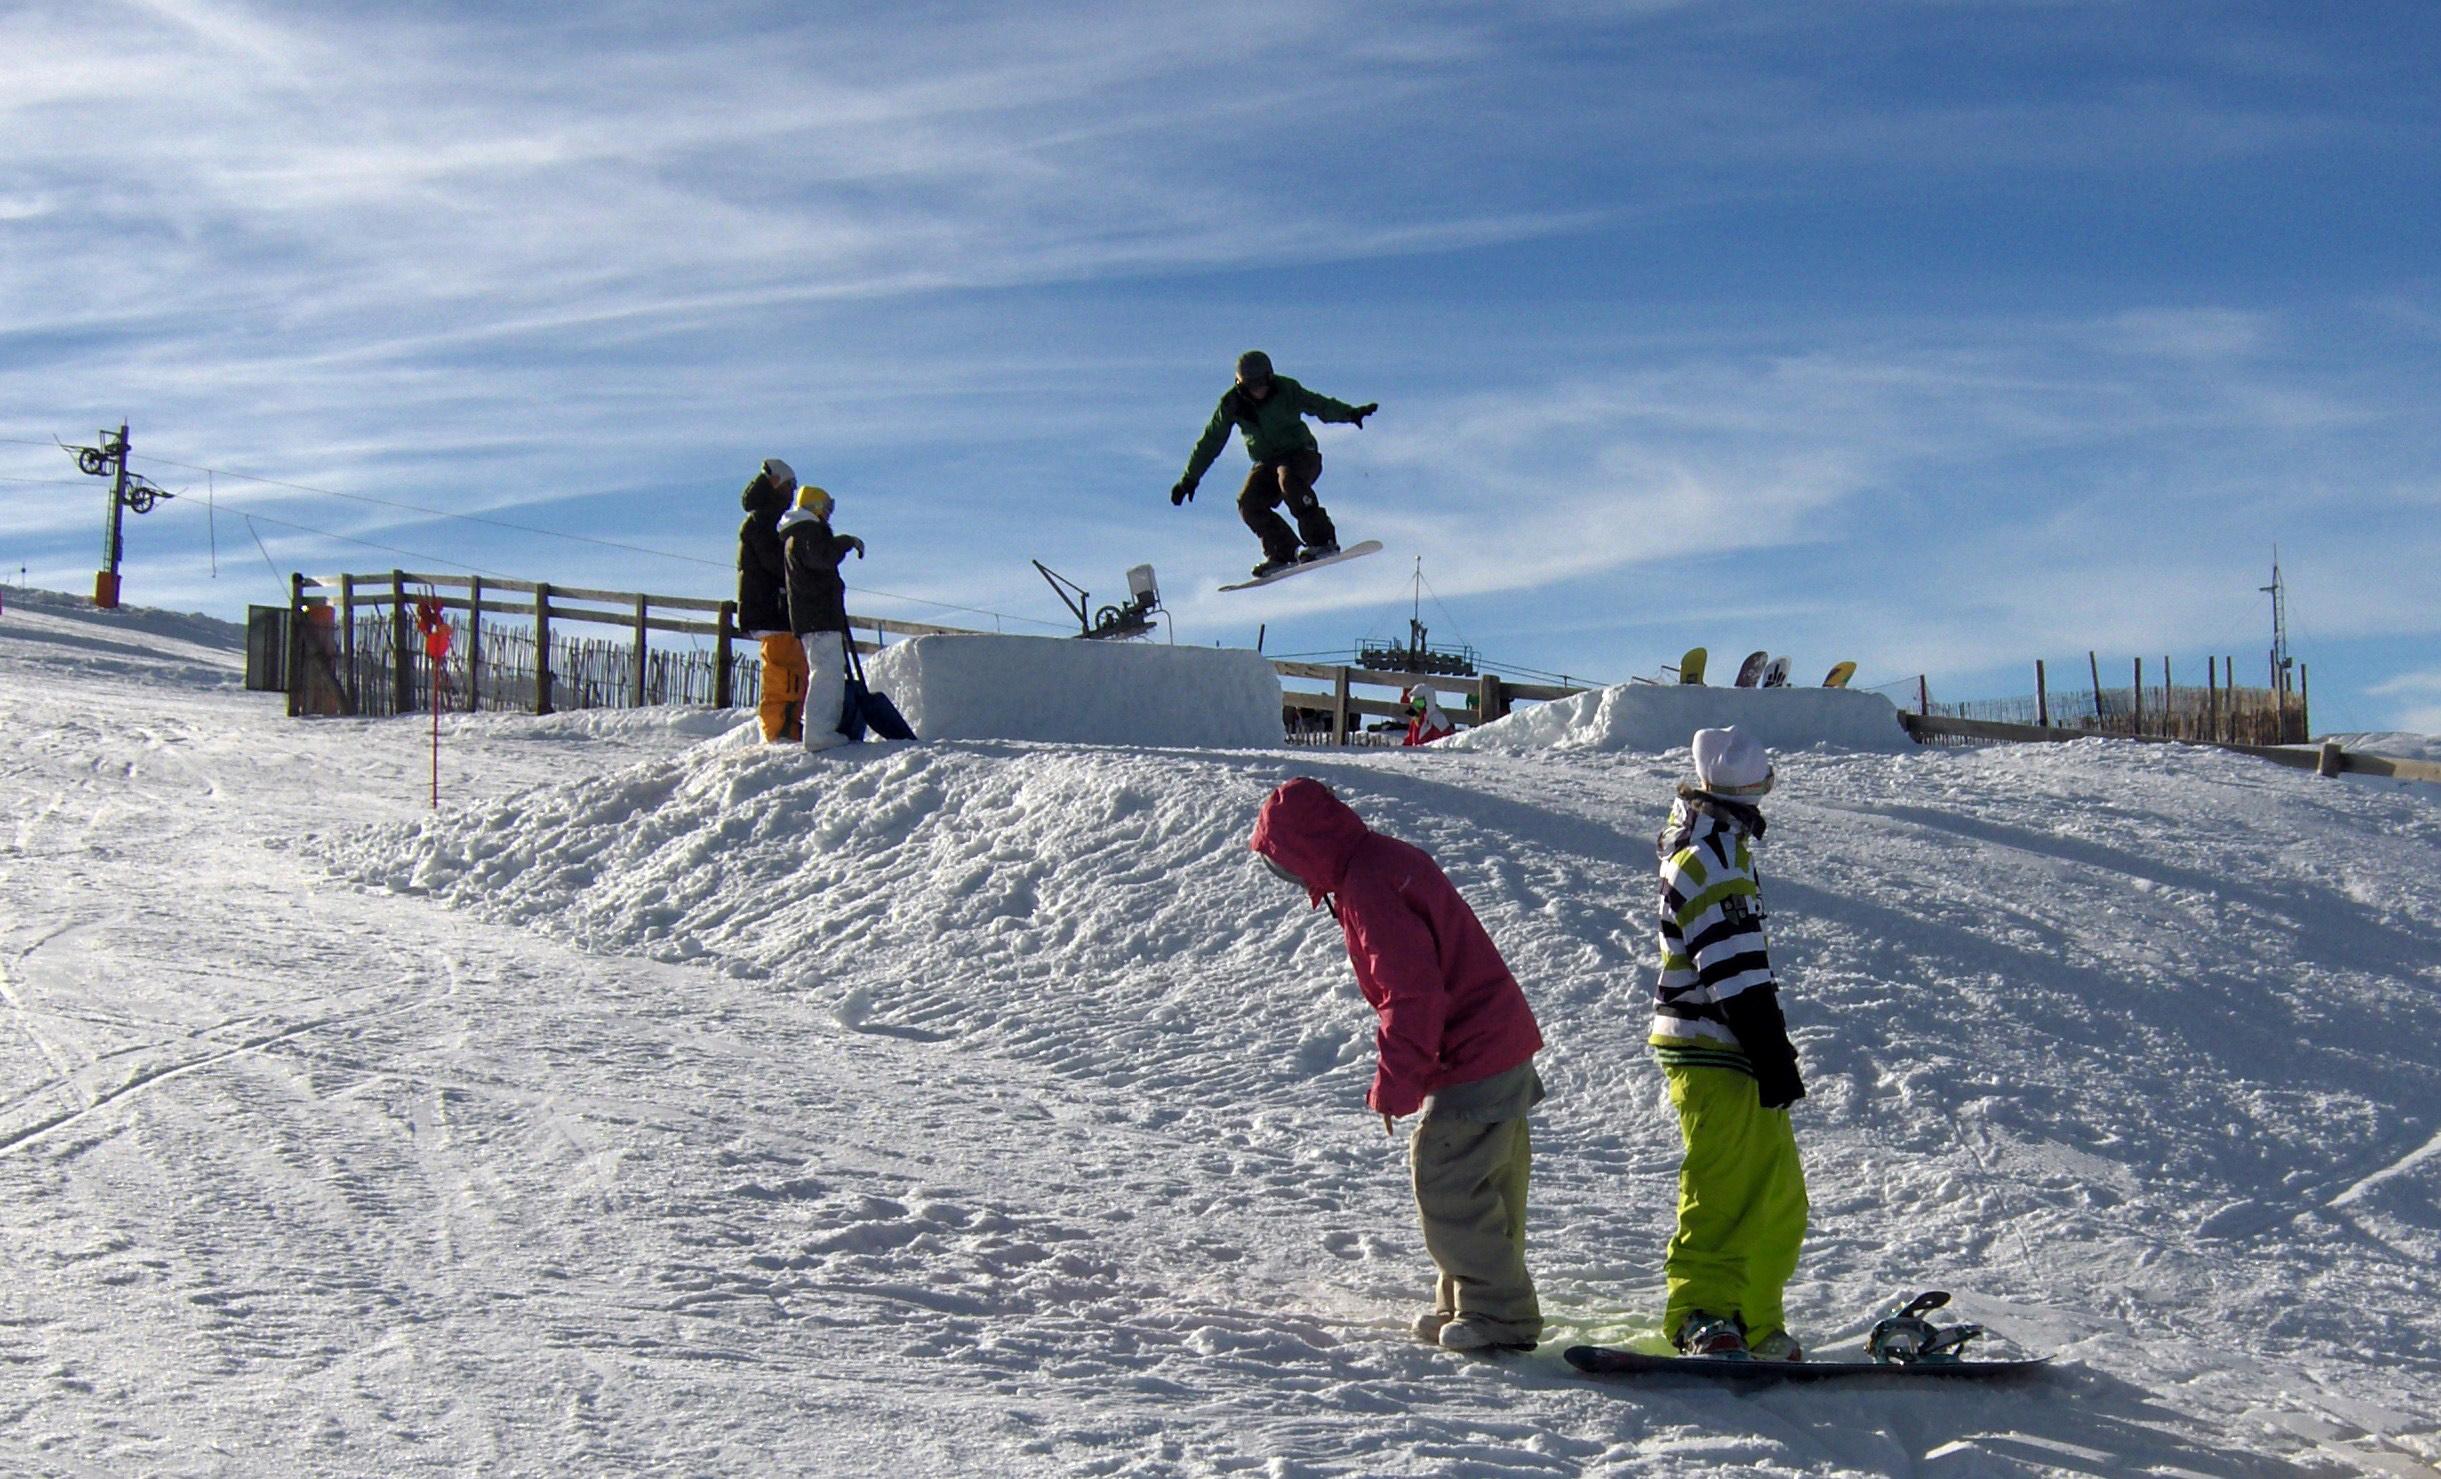 snow park, Sierra de Béjar - La Covatilla